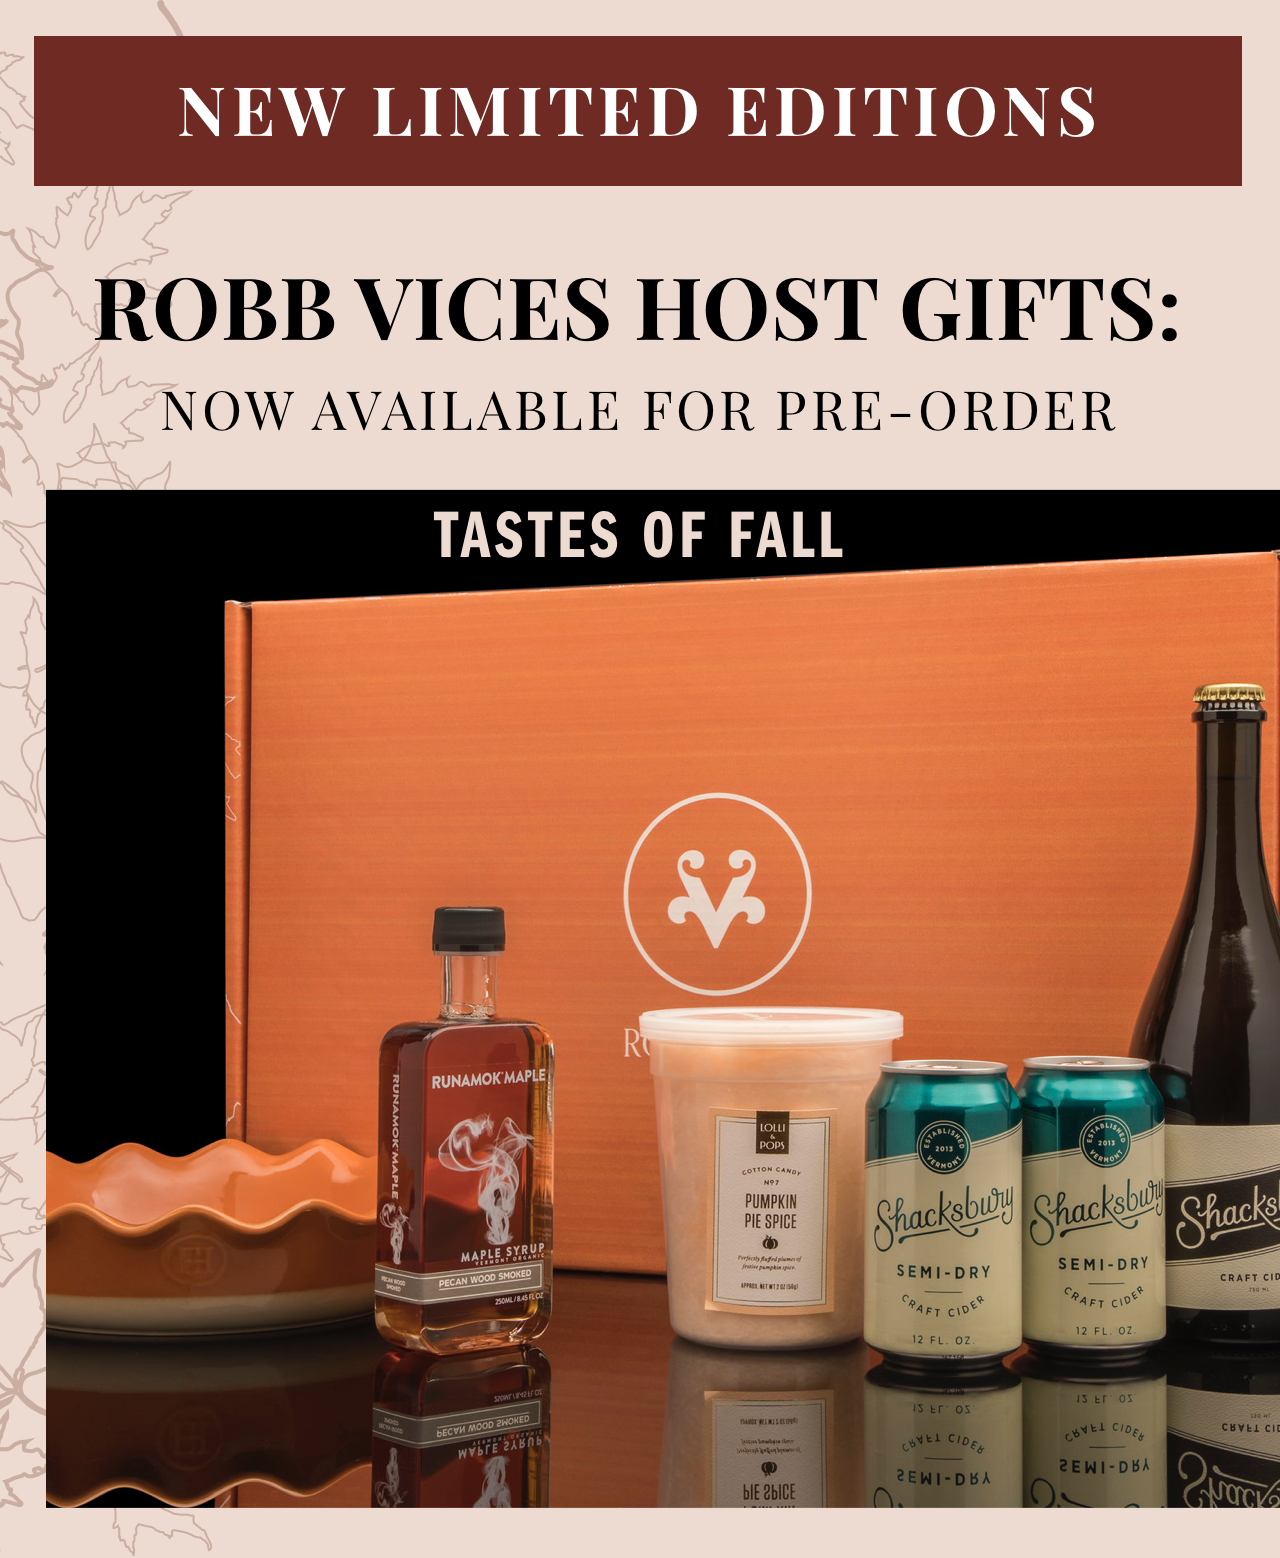 Tastes of Fall